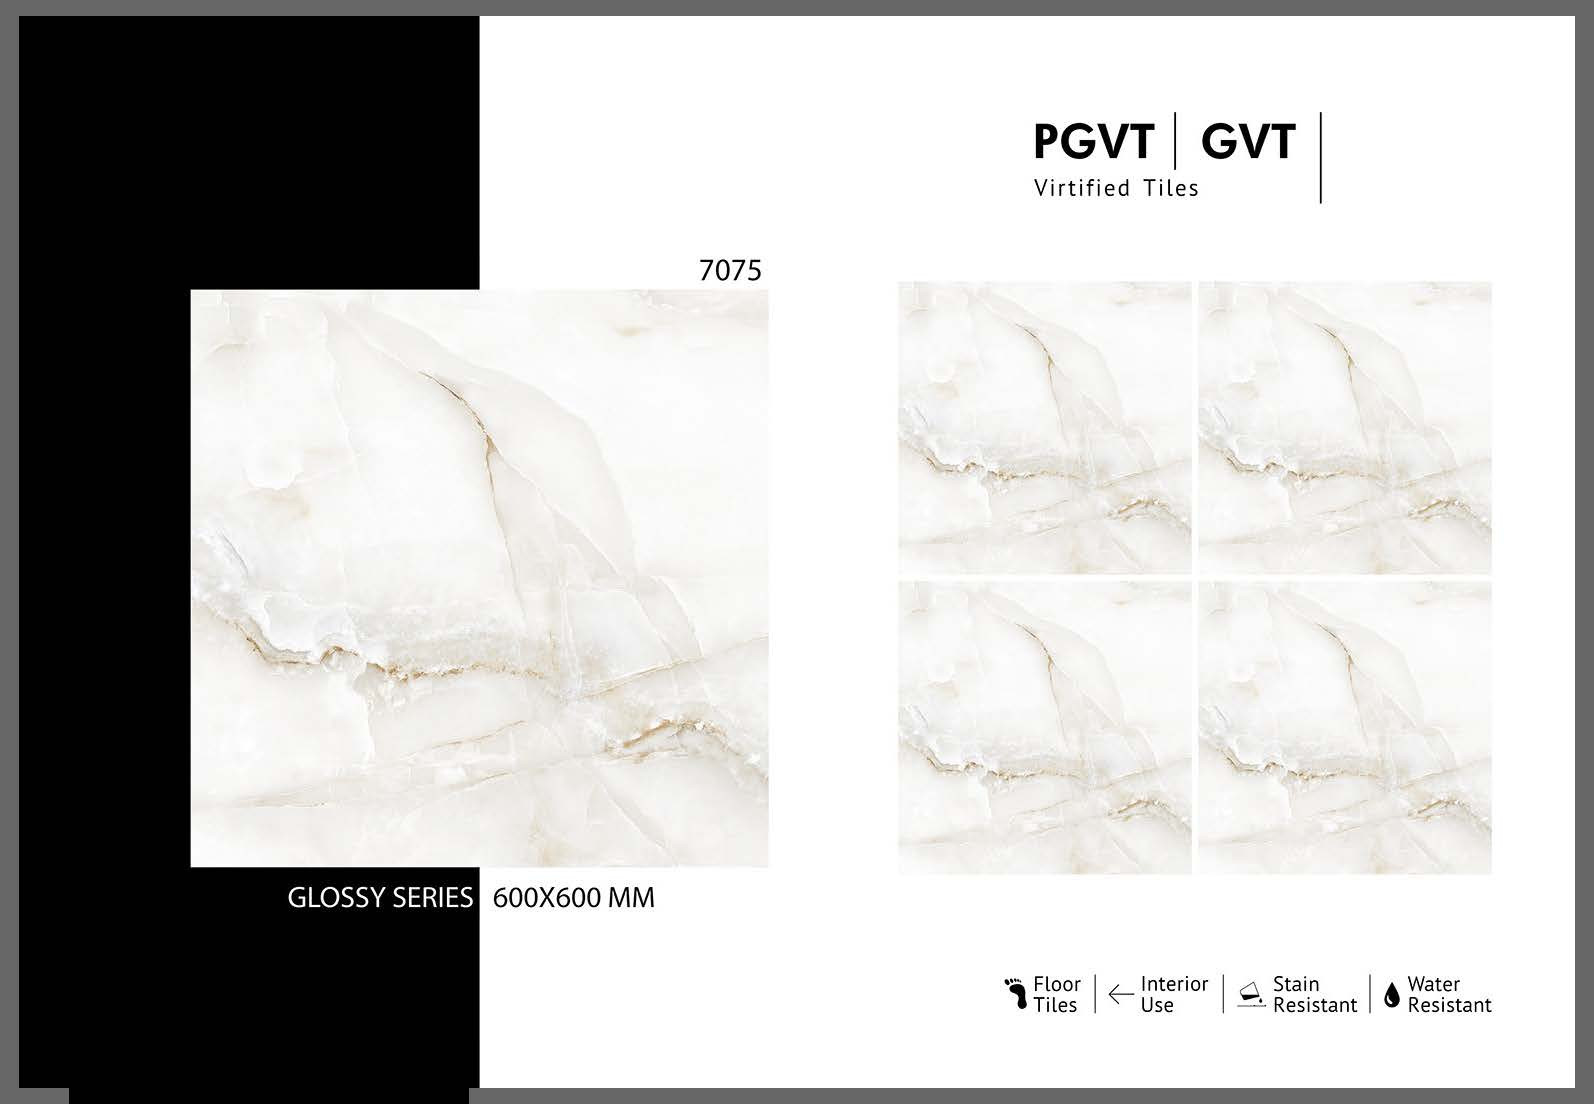 GVT 2X2 GLOSSY_Page_62.jpg